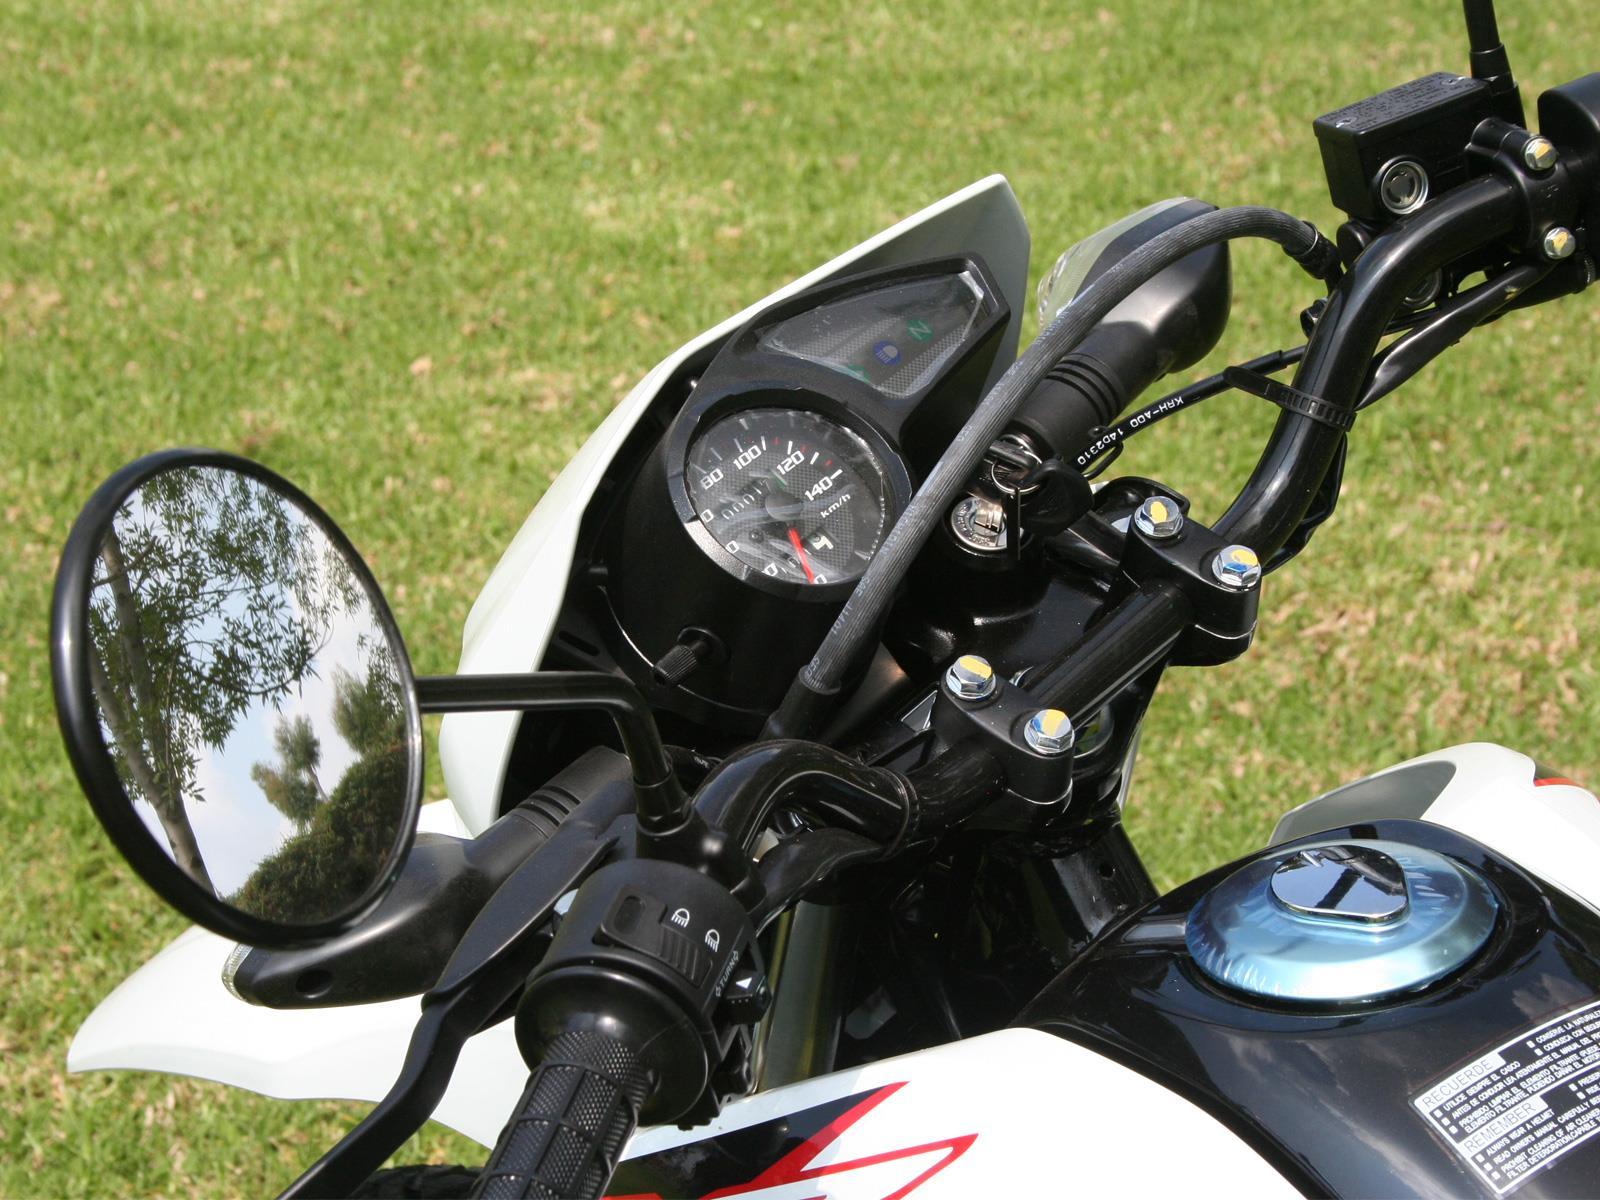 Honda XR 150 L 2015 a prueba - Autocosmos.com